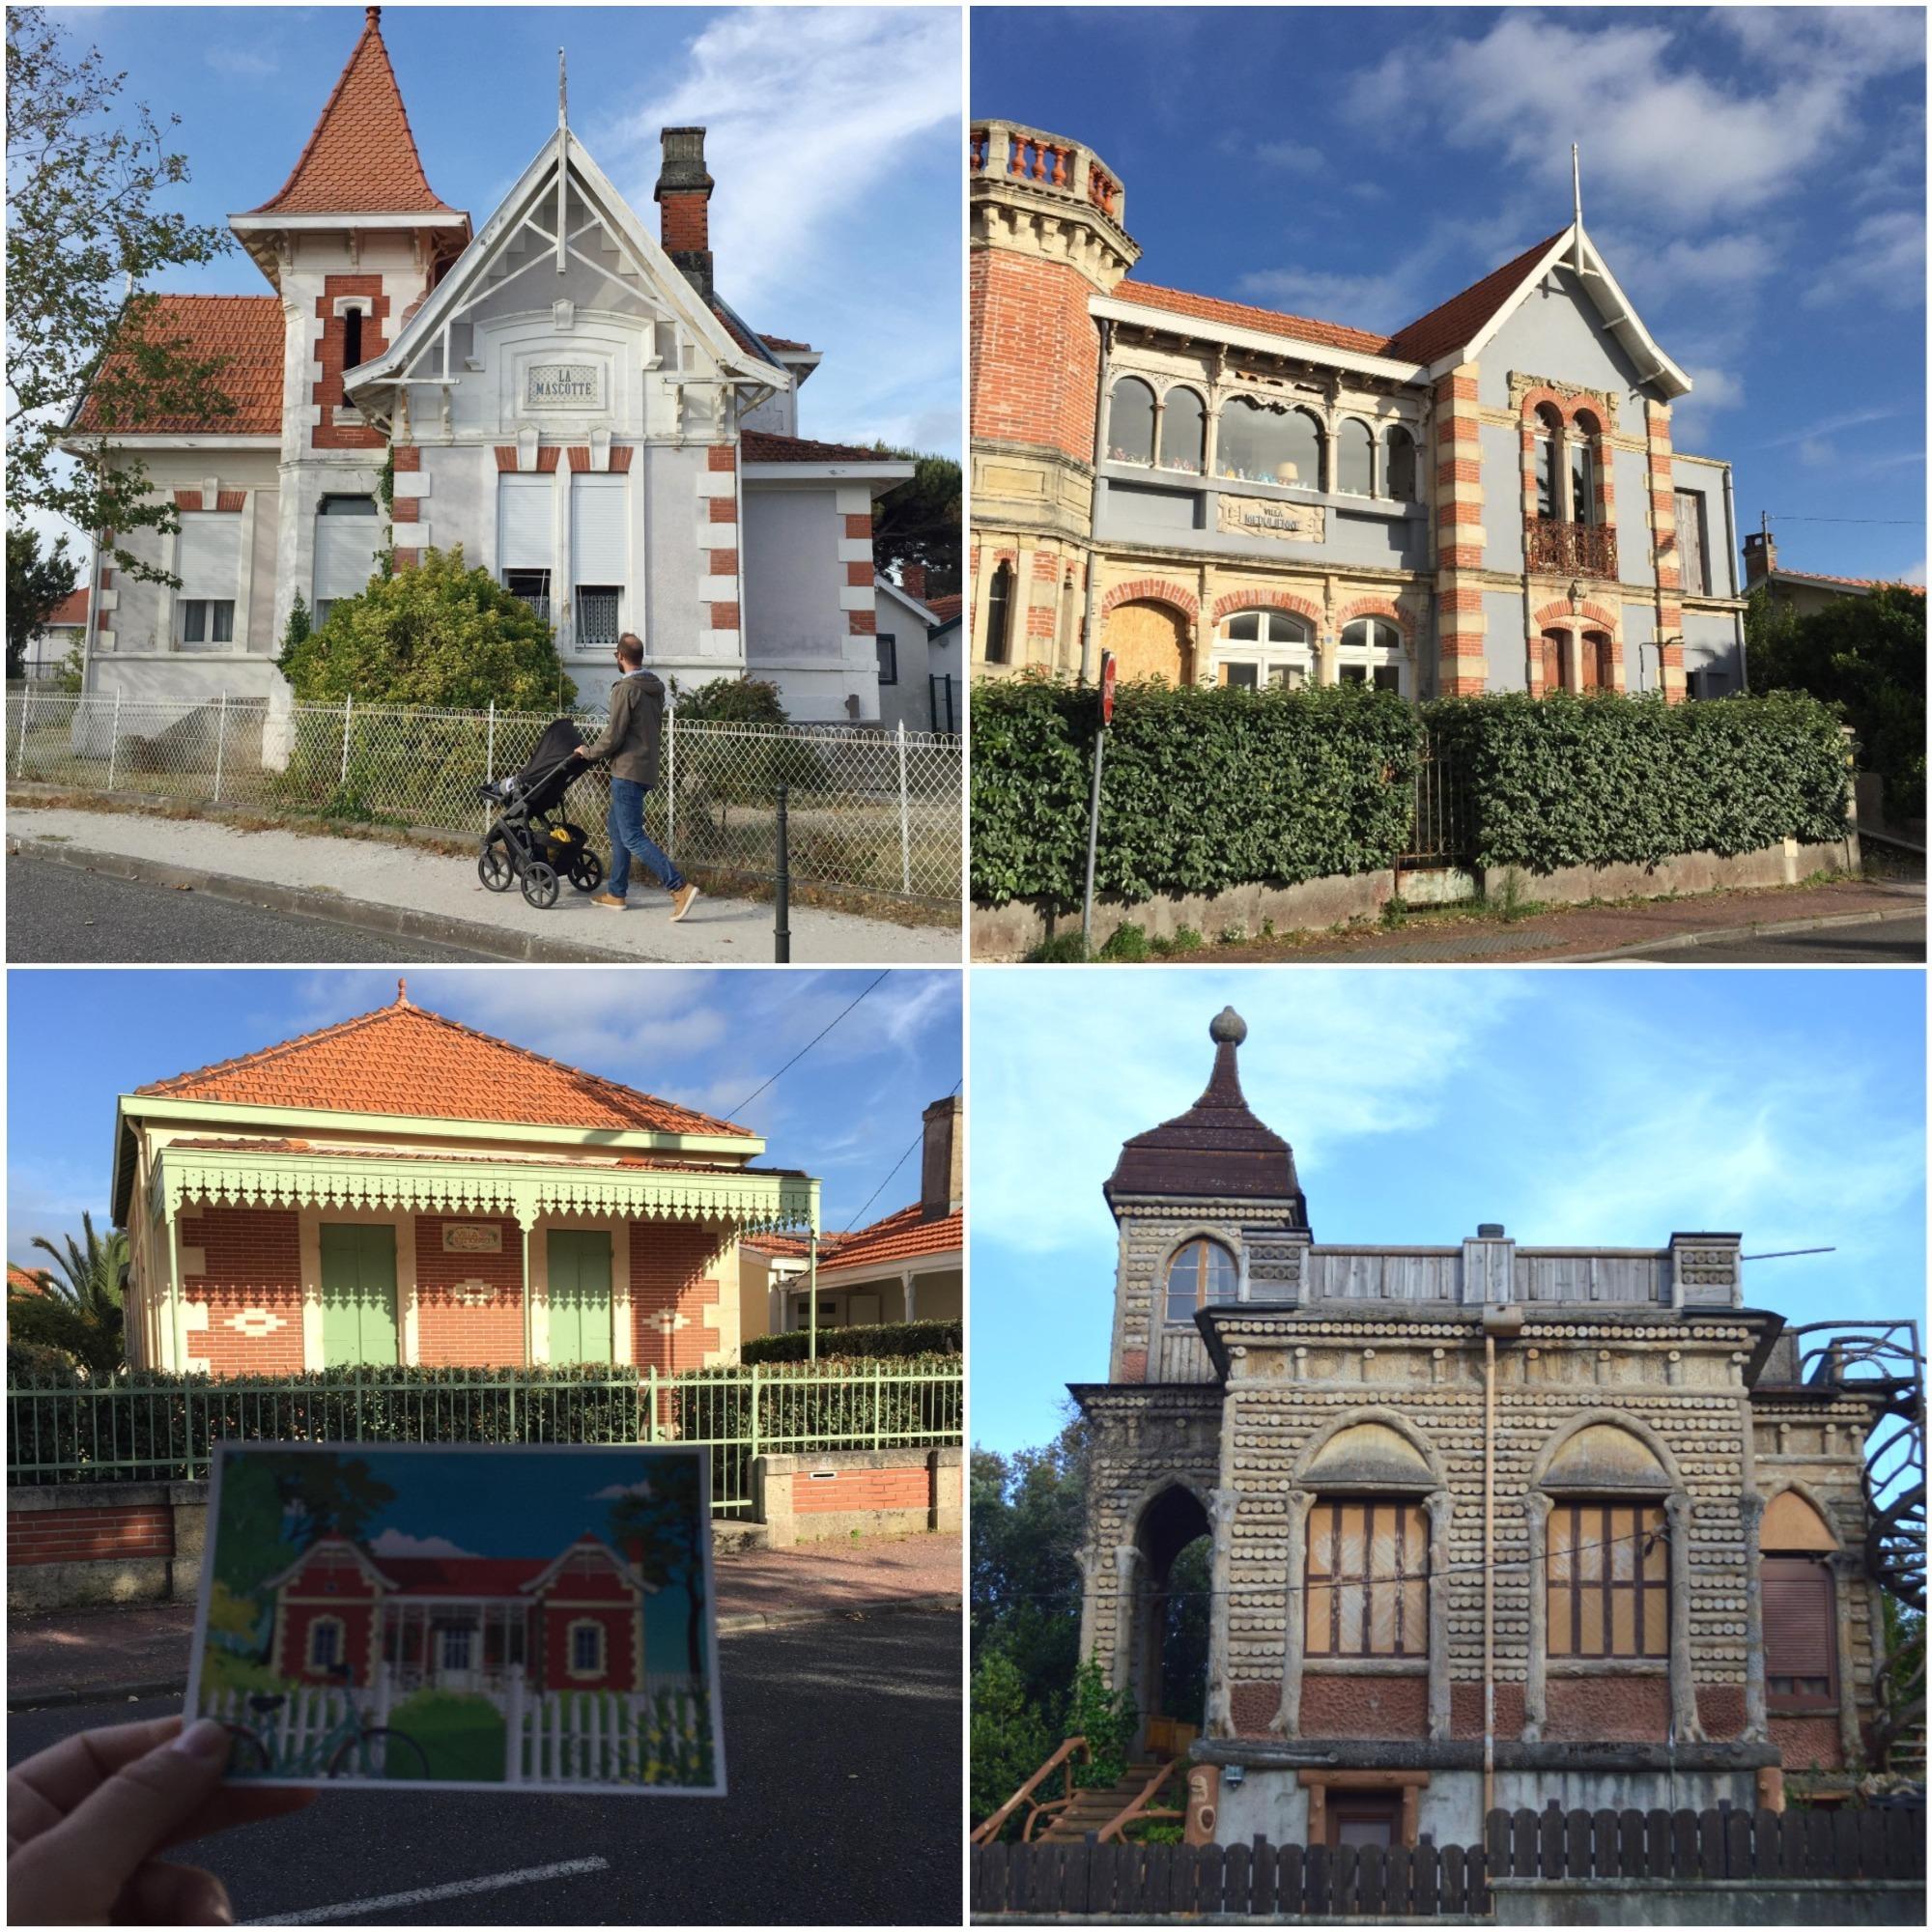 villas Soulac 1900